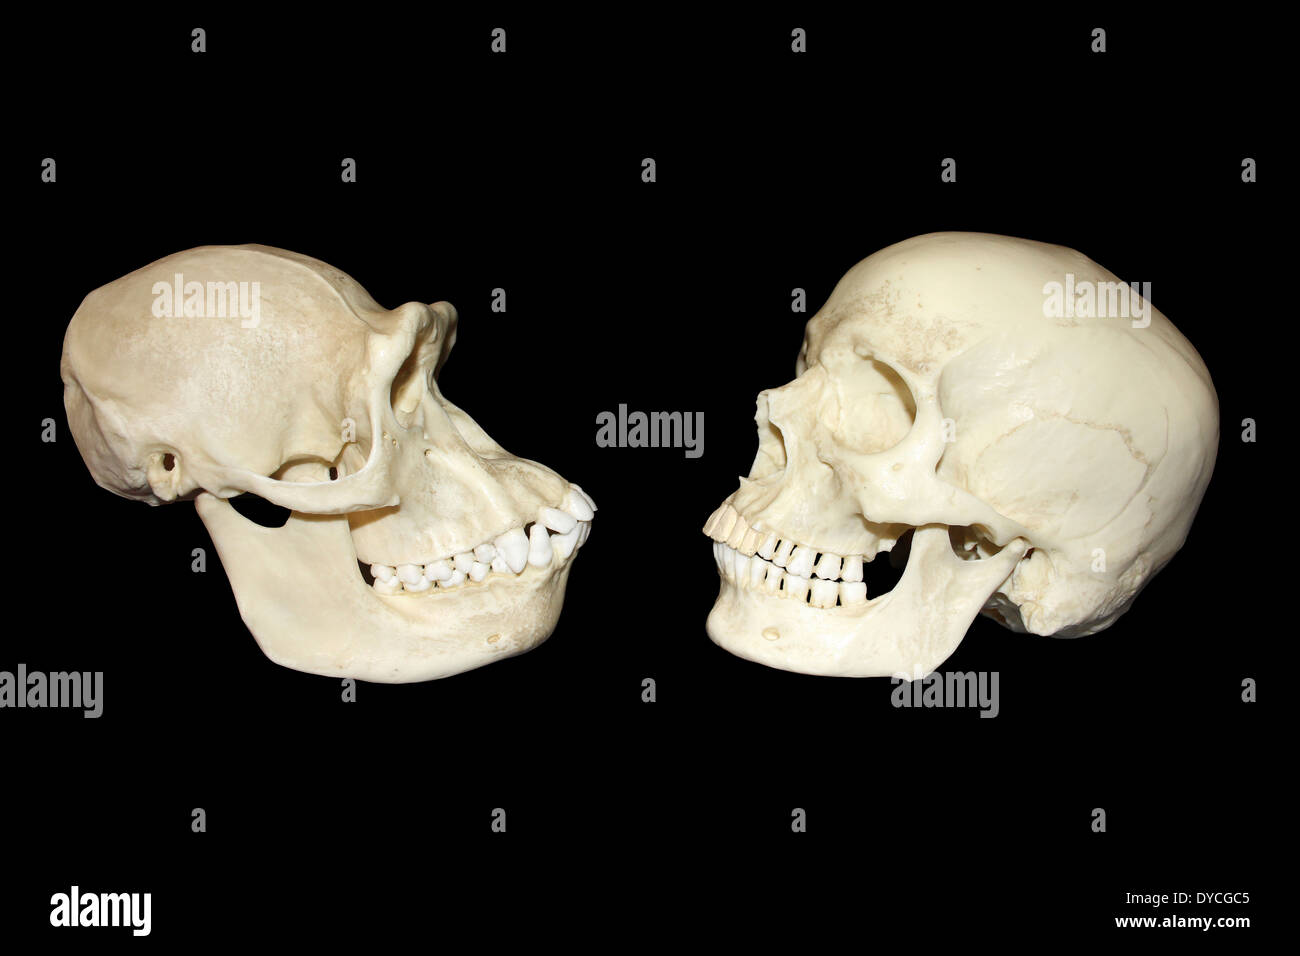 Comparison Between Skull Of Female Chimpanzee And Modern Human Homo sapiens - Stock Image